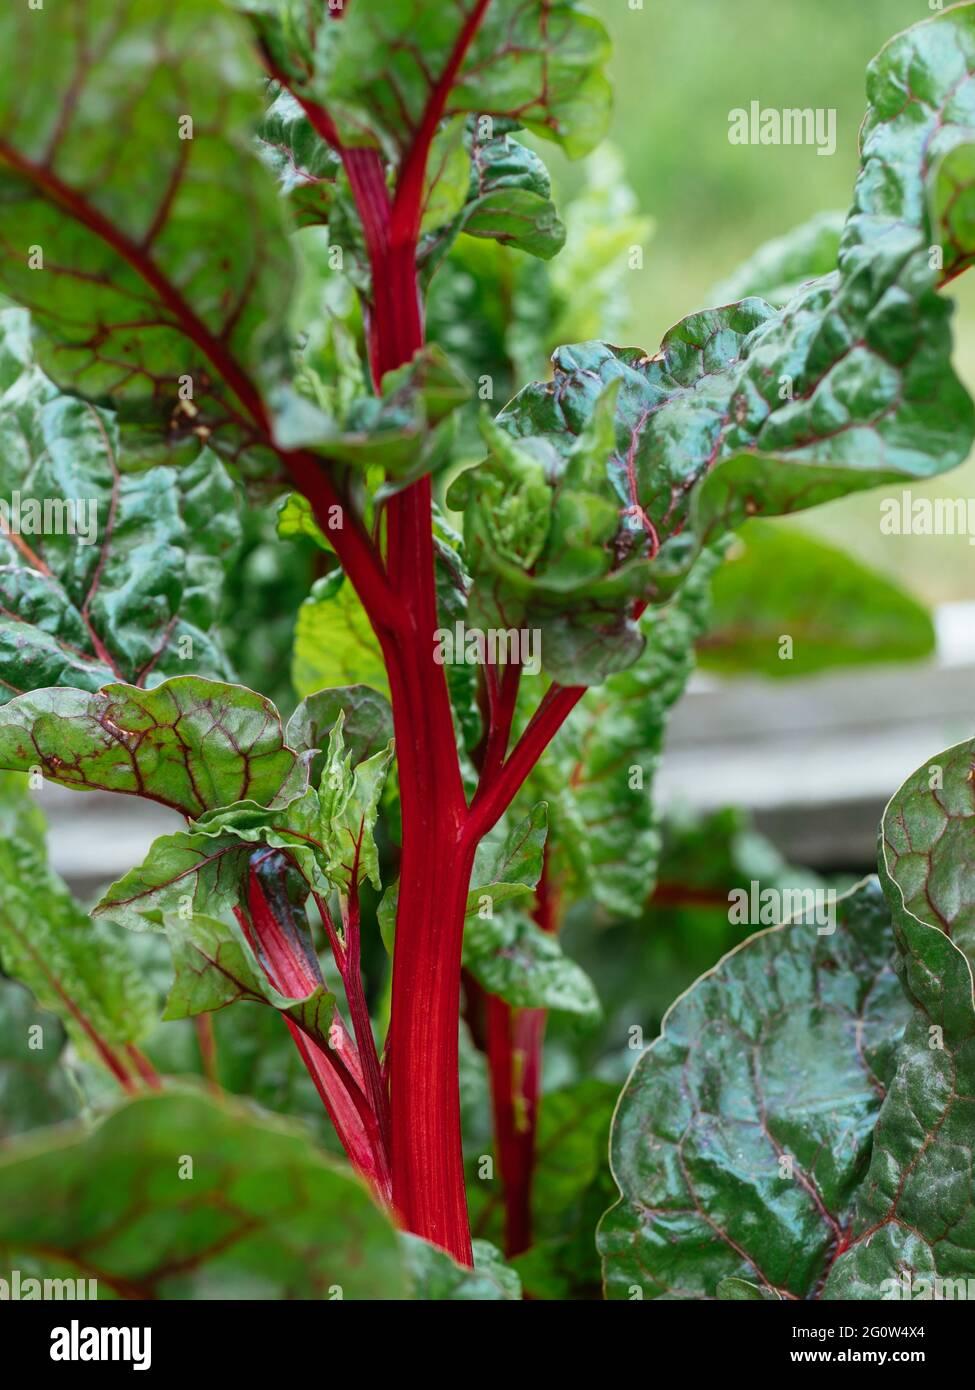 Red-stemmed Swiss chard (var. red vulkan) in a garden. Stock Photo